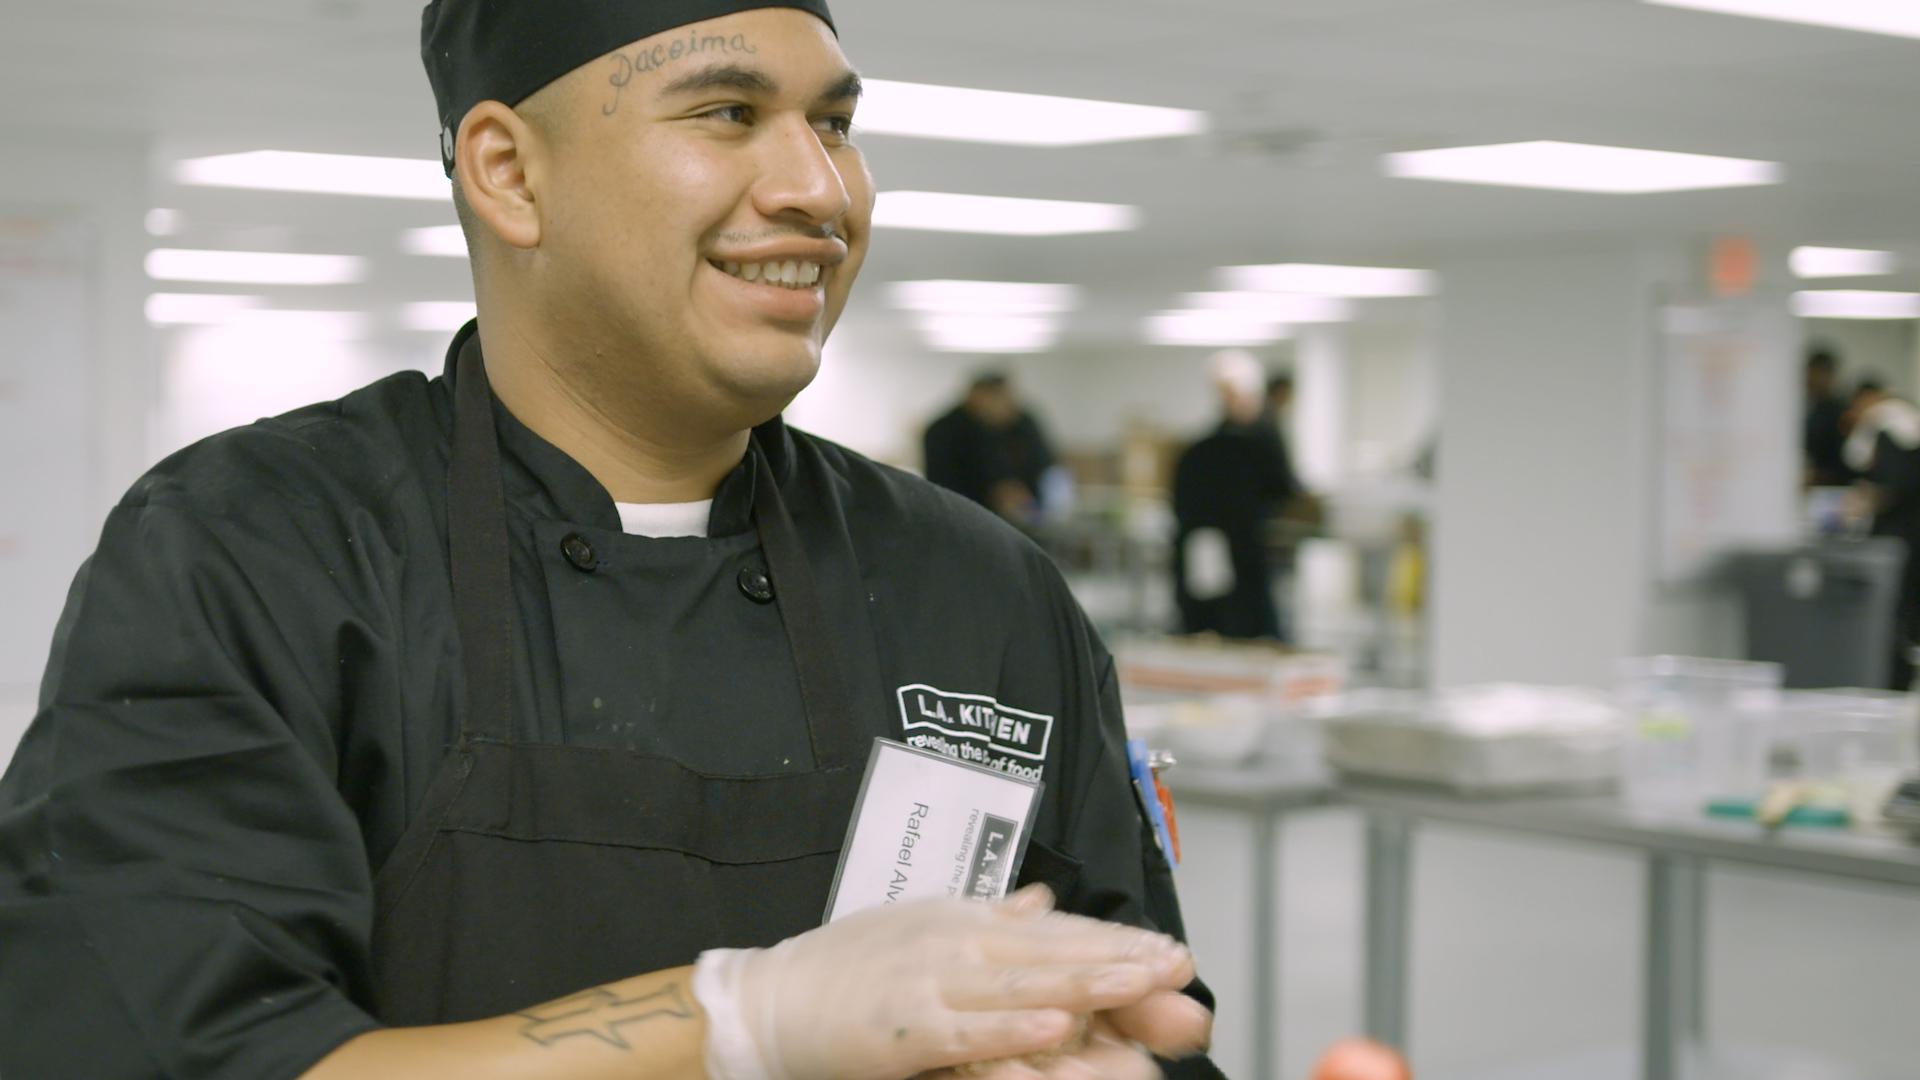 an LA Kitchen student smiling.